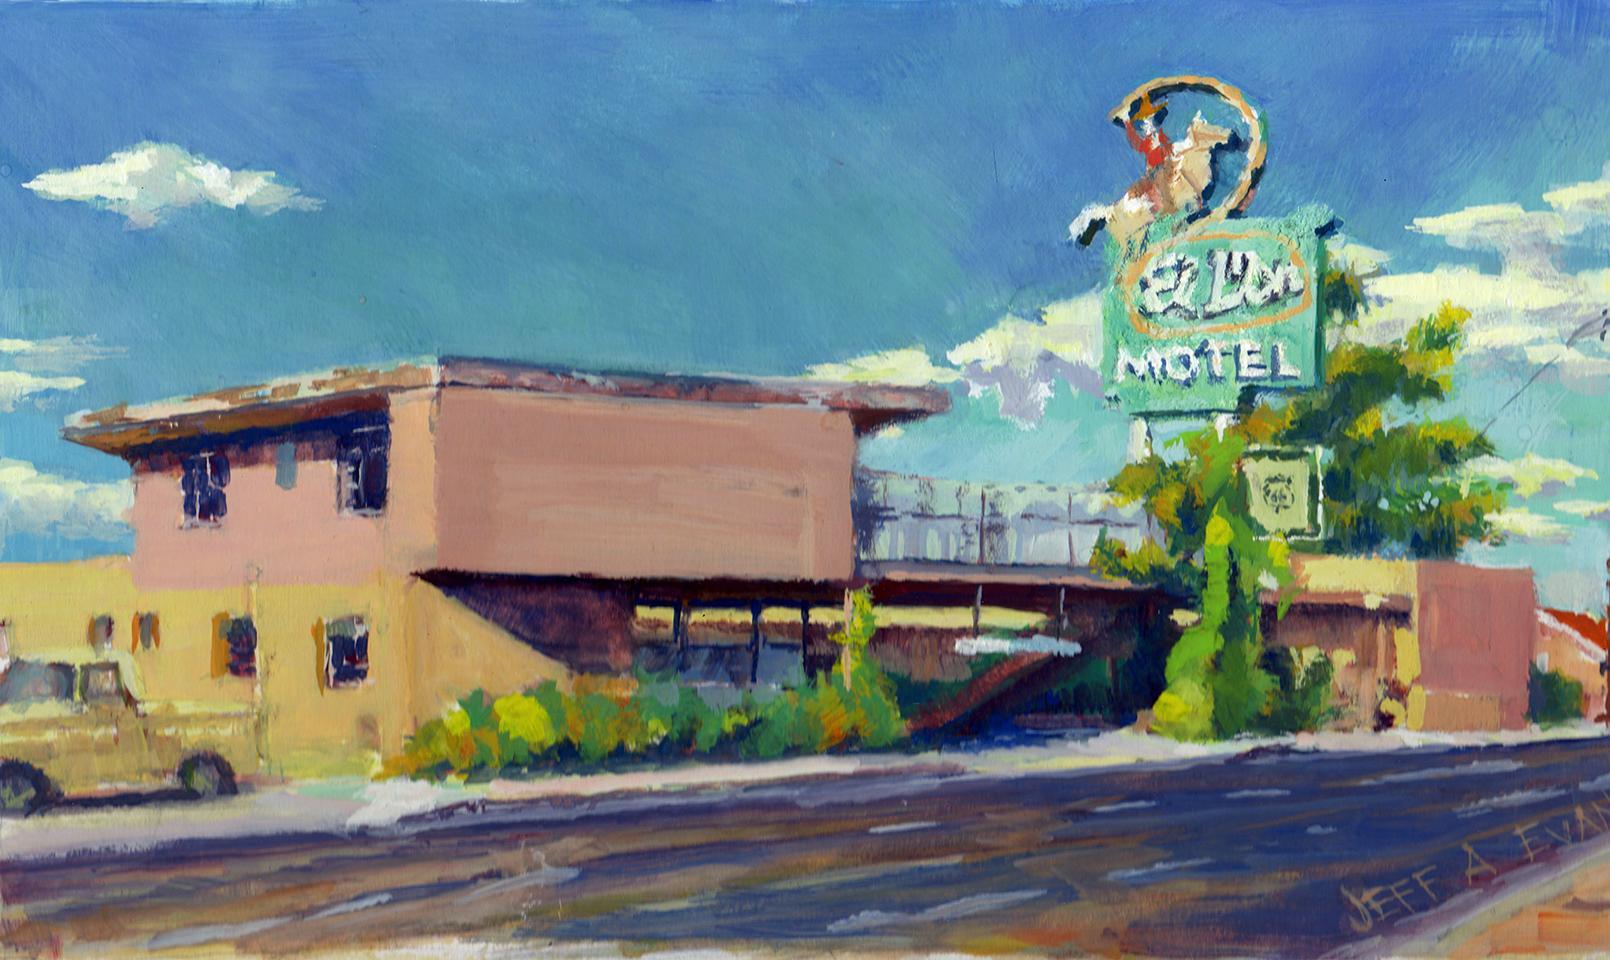 """MAKE MOTELS GREAT AGAIN"" - Albuquerque, NM - 11 x 7 gouache on illustration board"